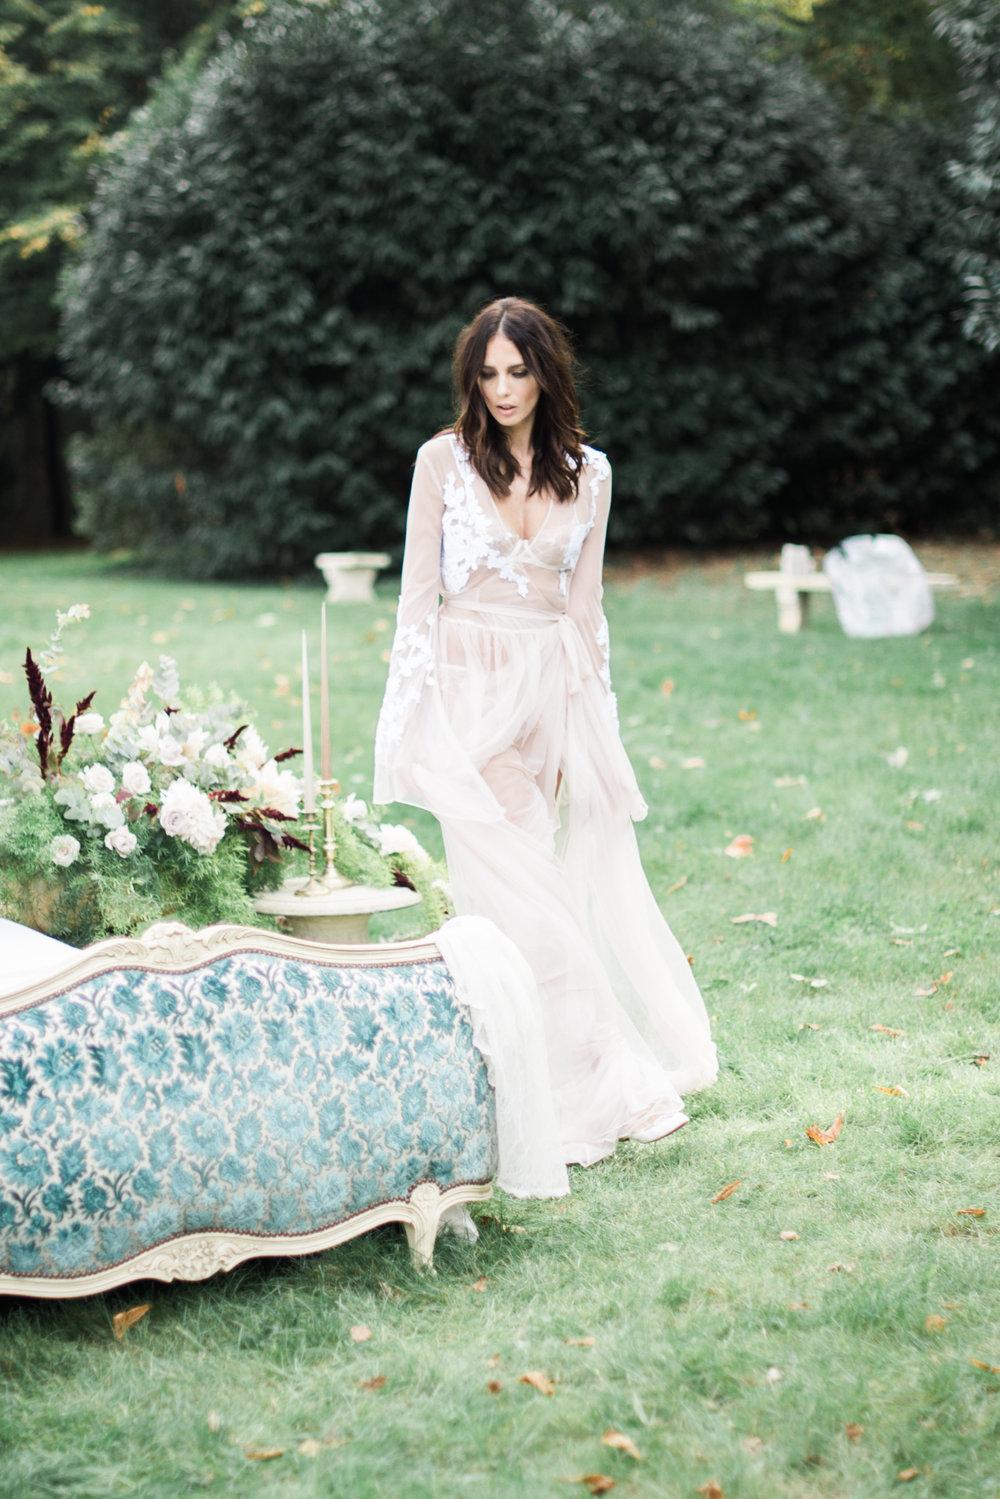 JacquelineAnnePhotography-Boudoir-Outdoors-6.jpg